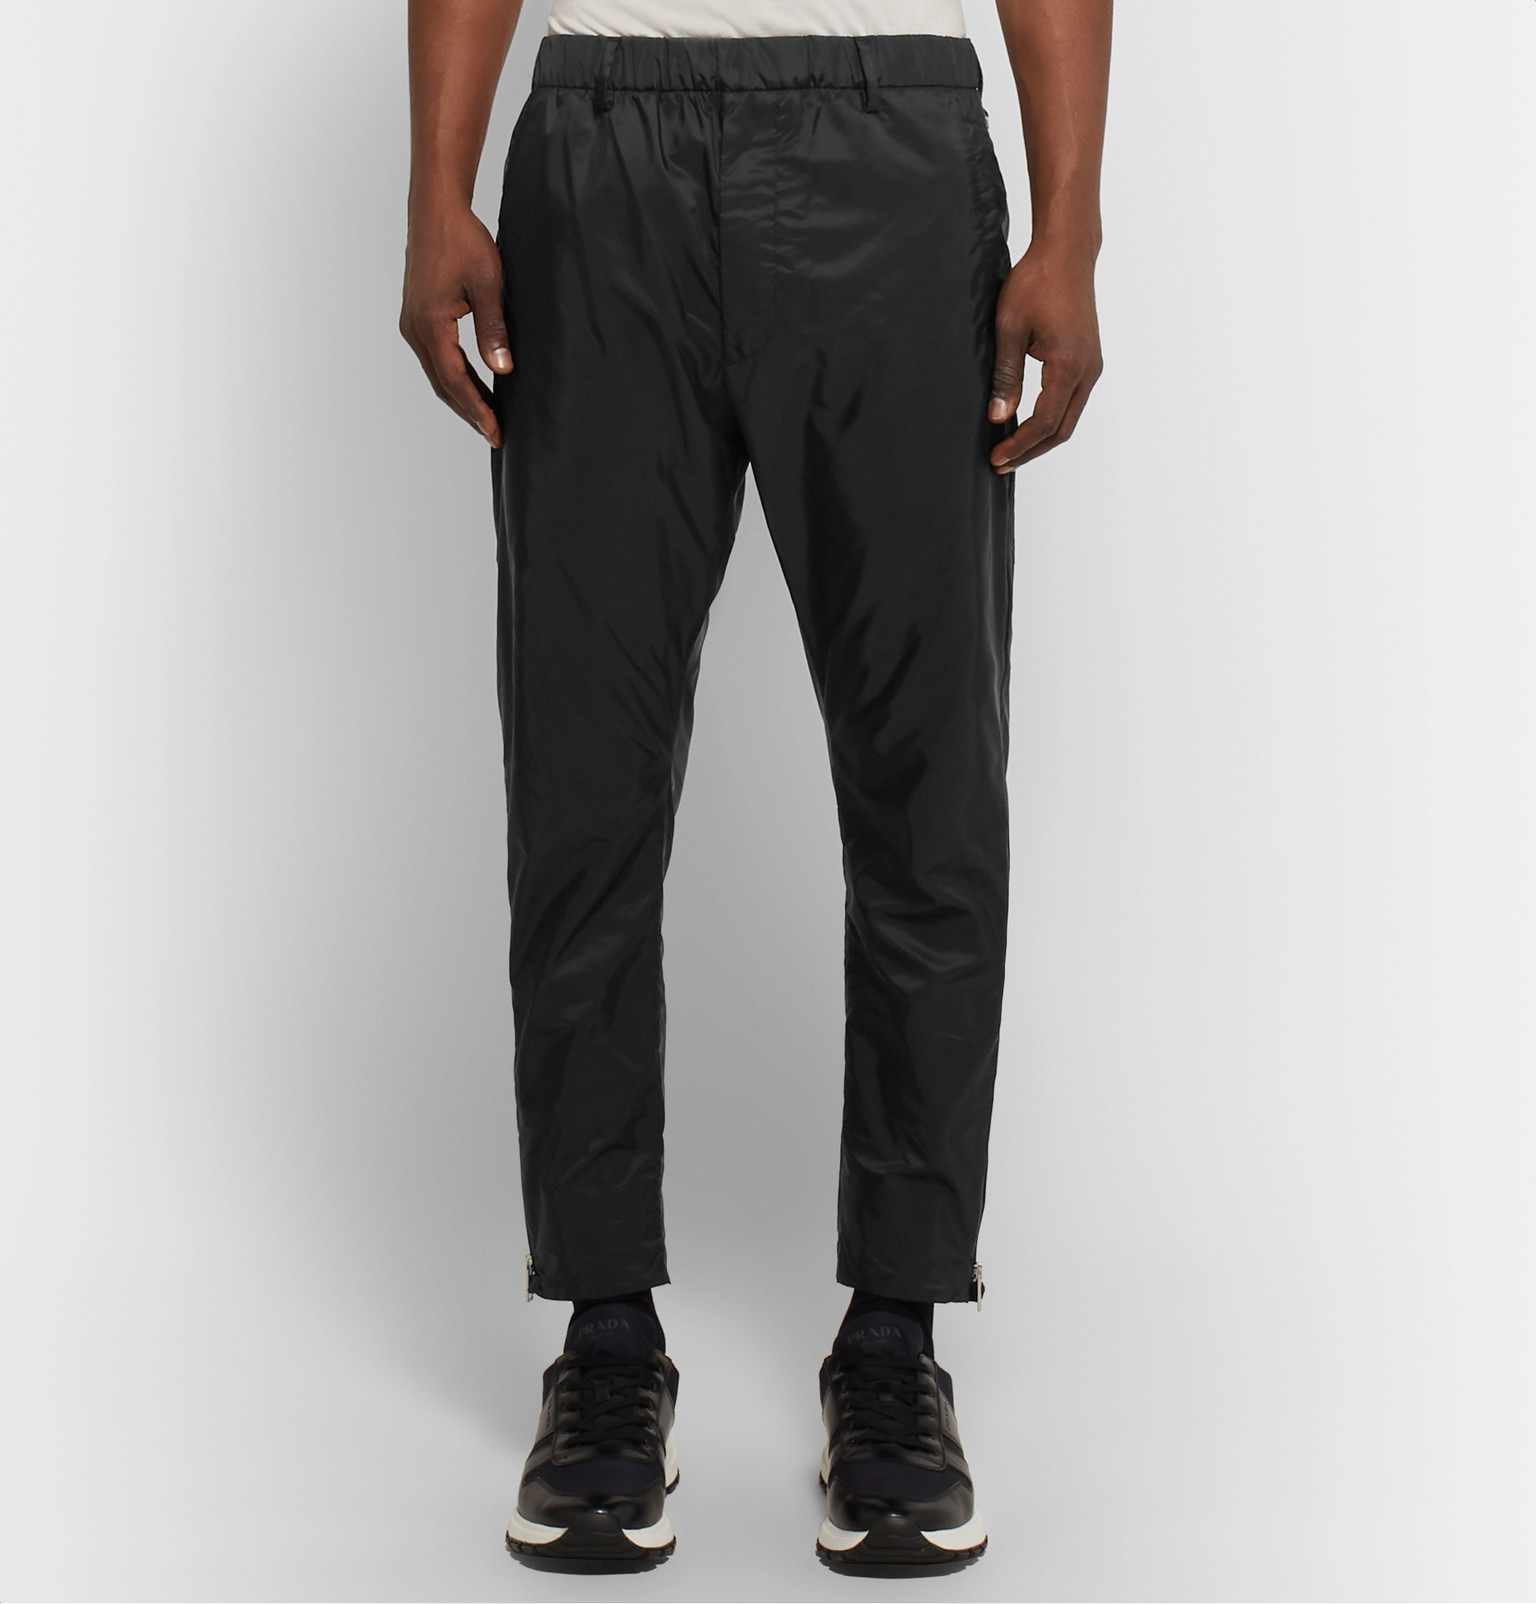 Prada Slim Fit Tapered Nylon Track Pants